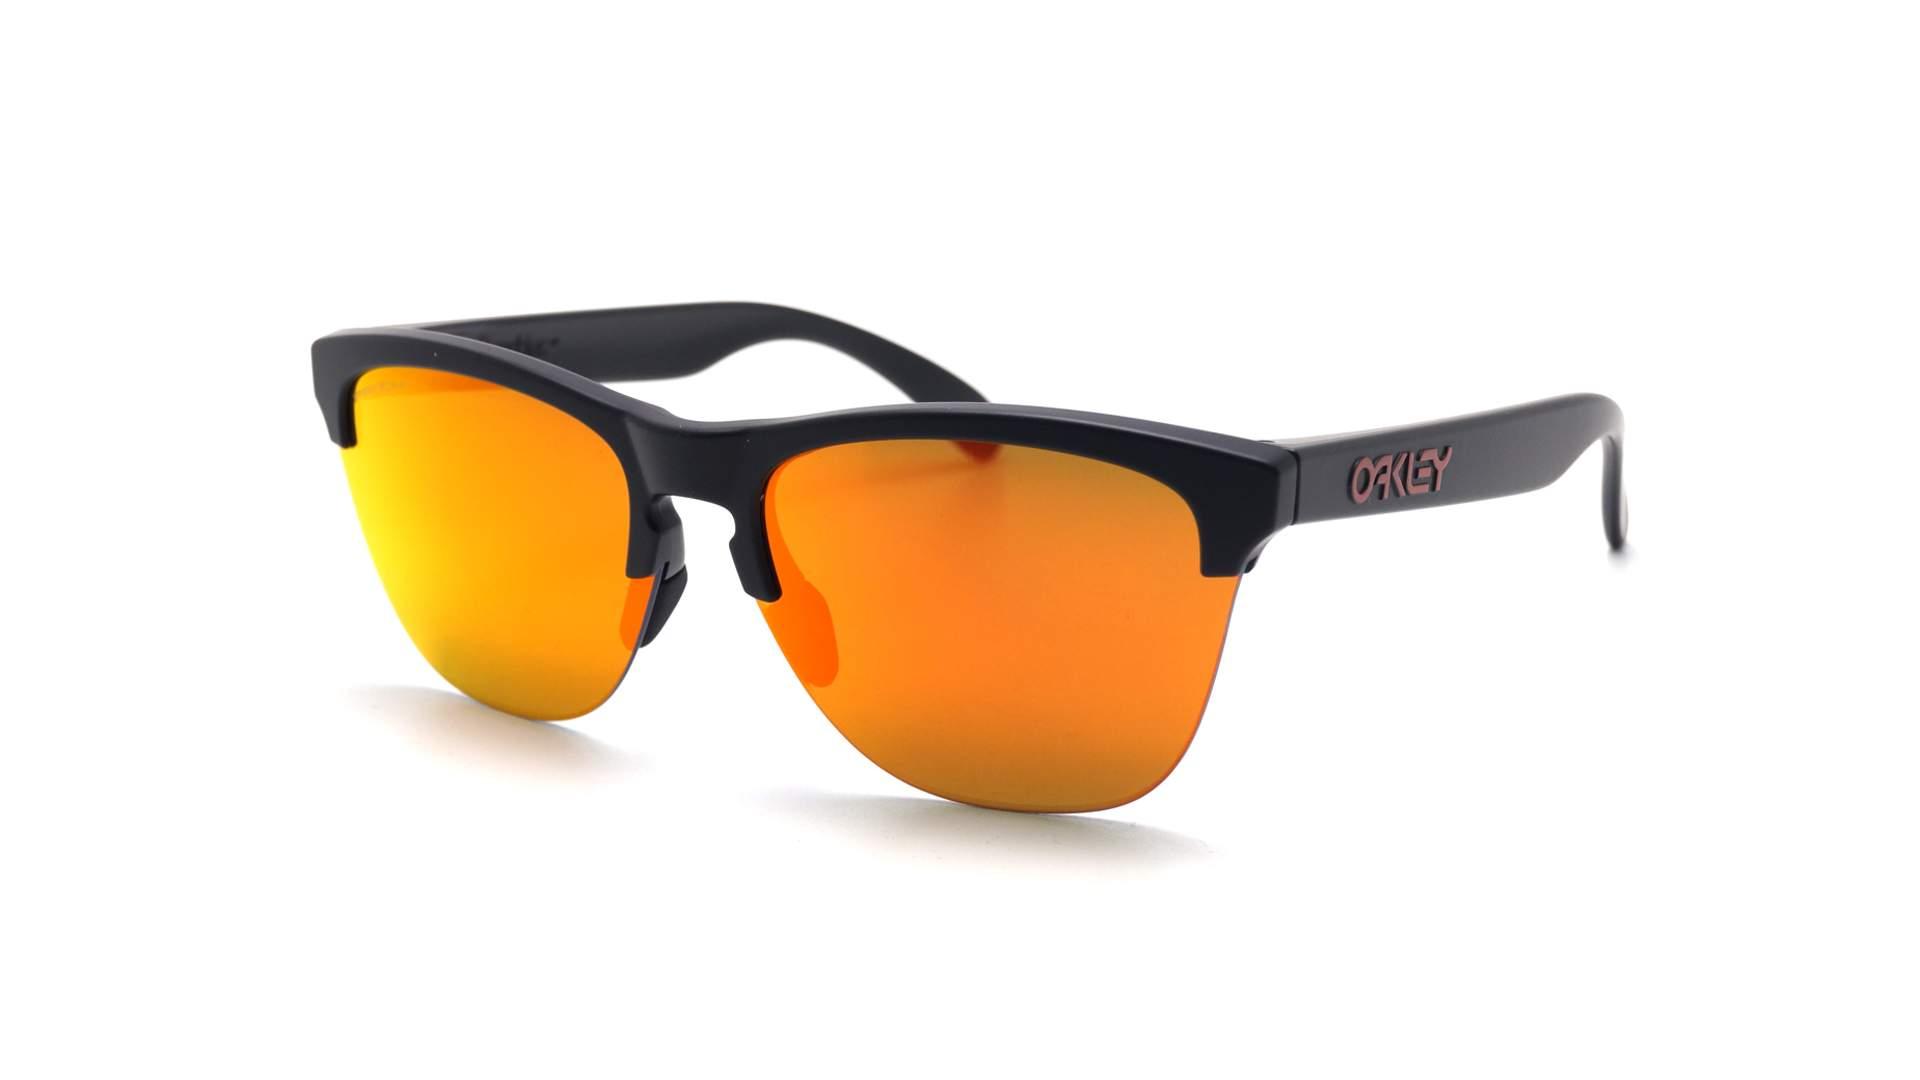 f7caf64fa4 Sunglasses Oakley Frogskins Lite Matte black OO9374 04 63-10 Prizm Ruby